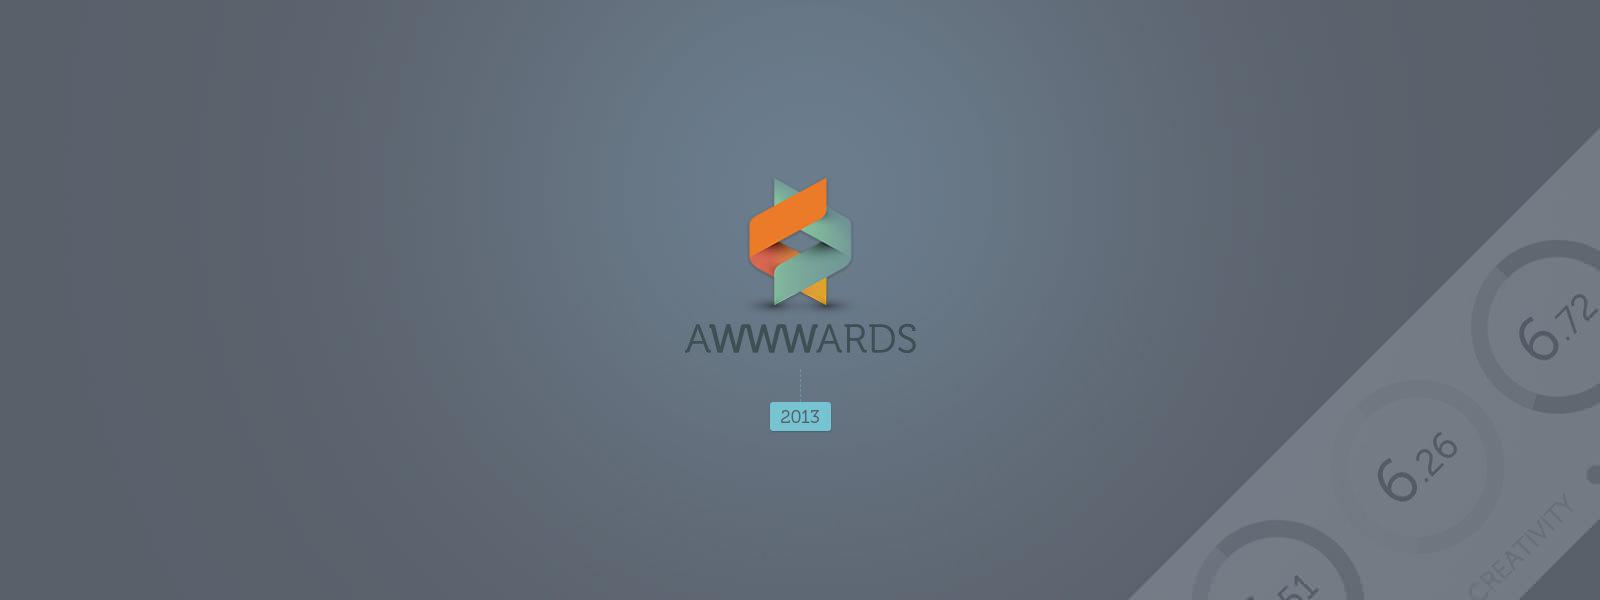 Muse Comunicazione - Nomination su Awwwards.com